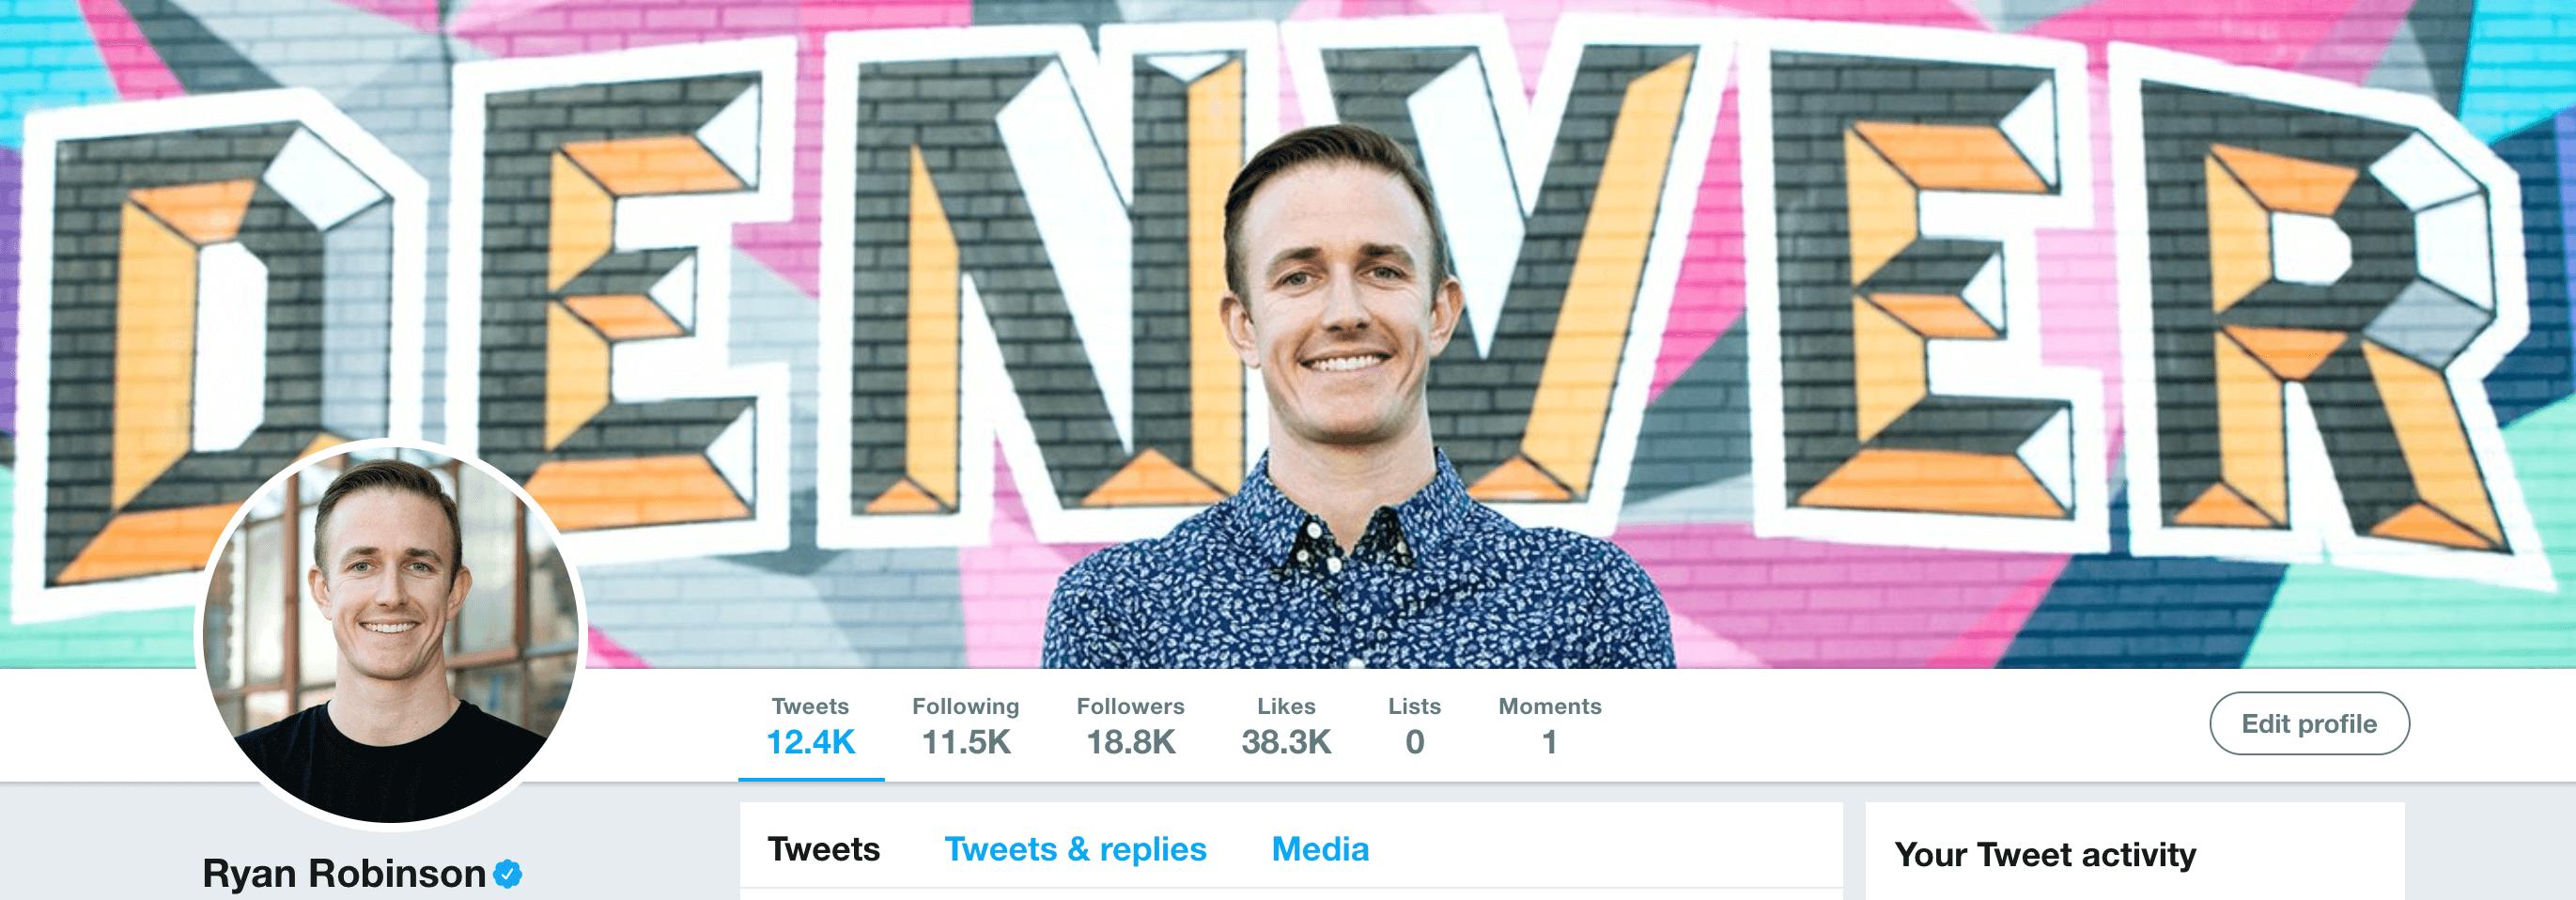 Ryan Robinson Content Marketing Consultant, Entrepreneur, Writer on Twitter